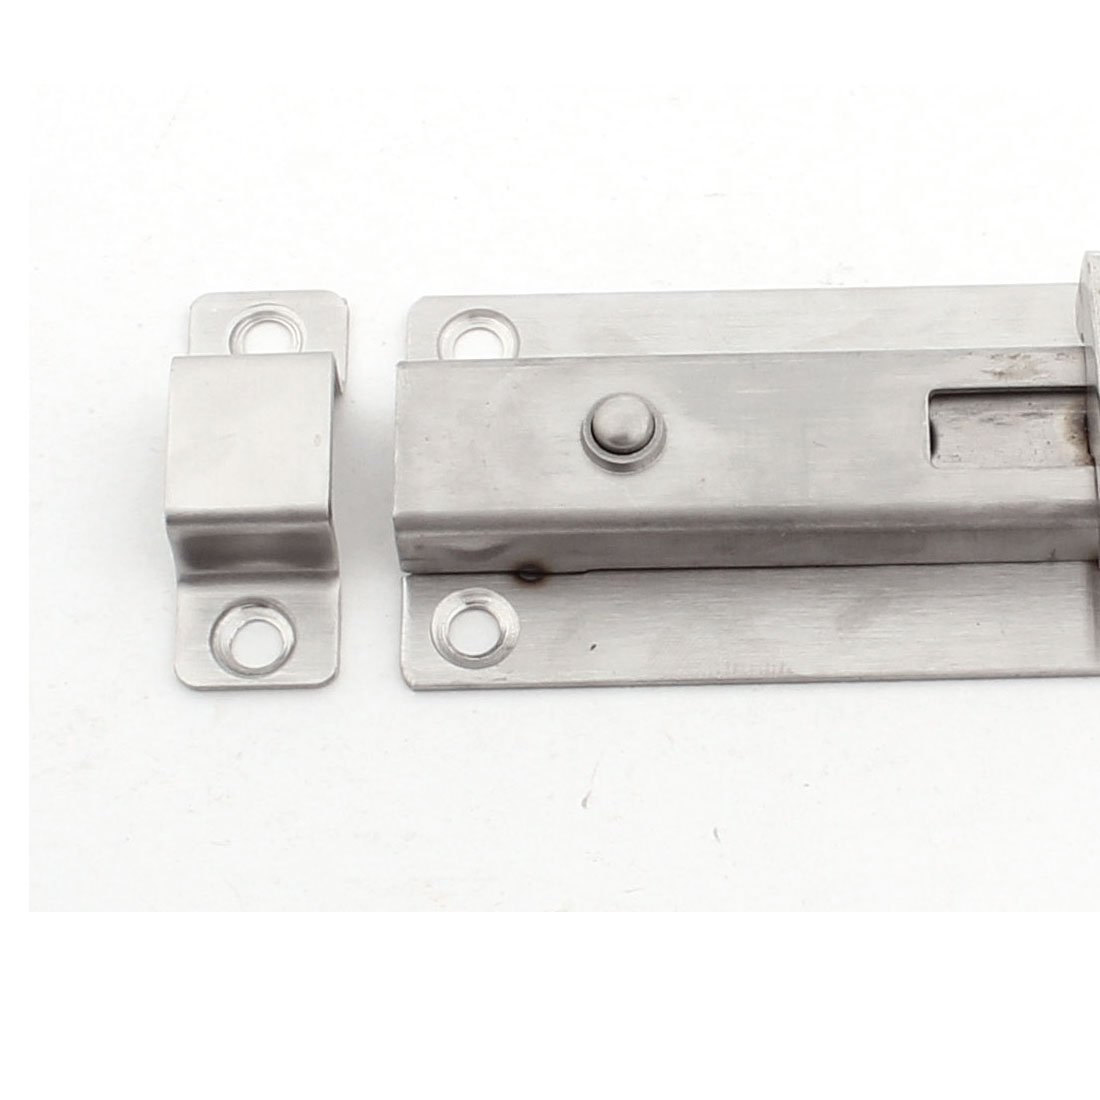 Botón eDealMax puerta del armario Armario de 4 pulgadas de prensa abierta pestillo tono de plata - - Amazon.com